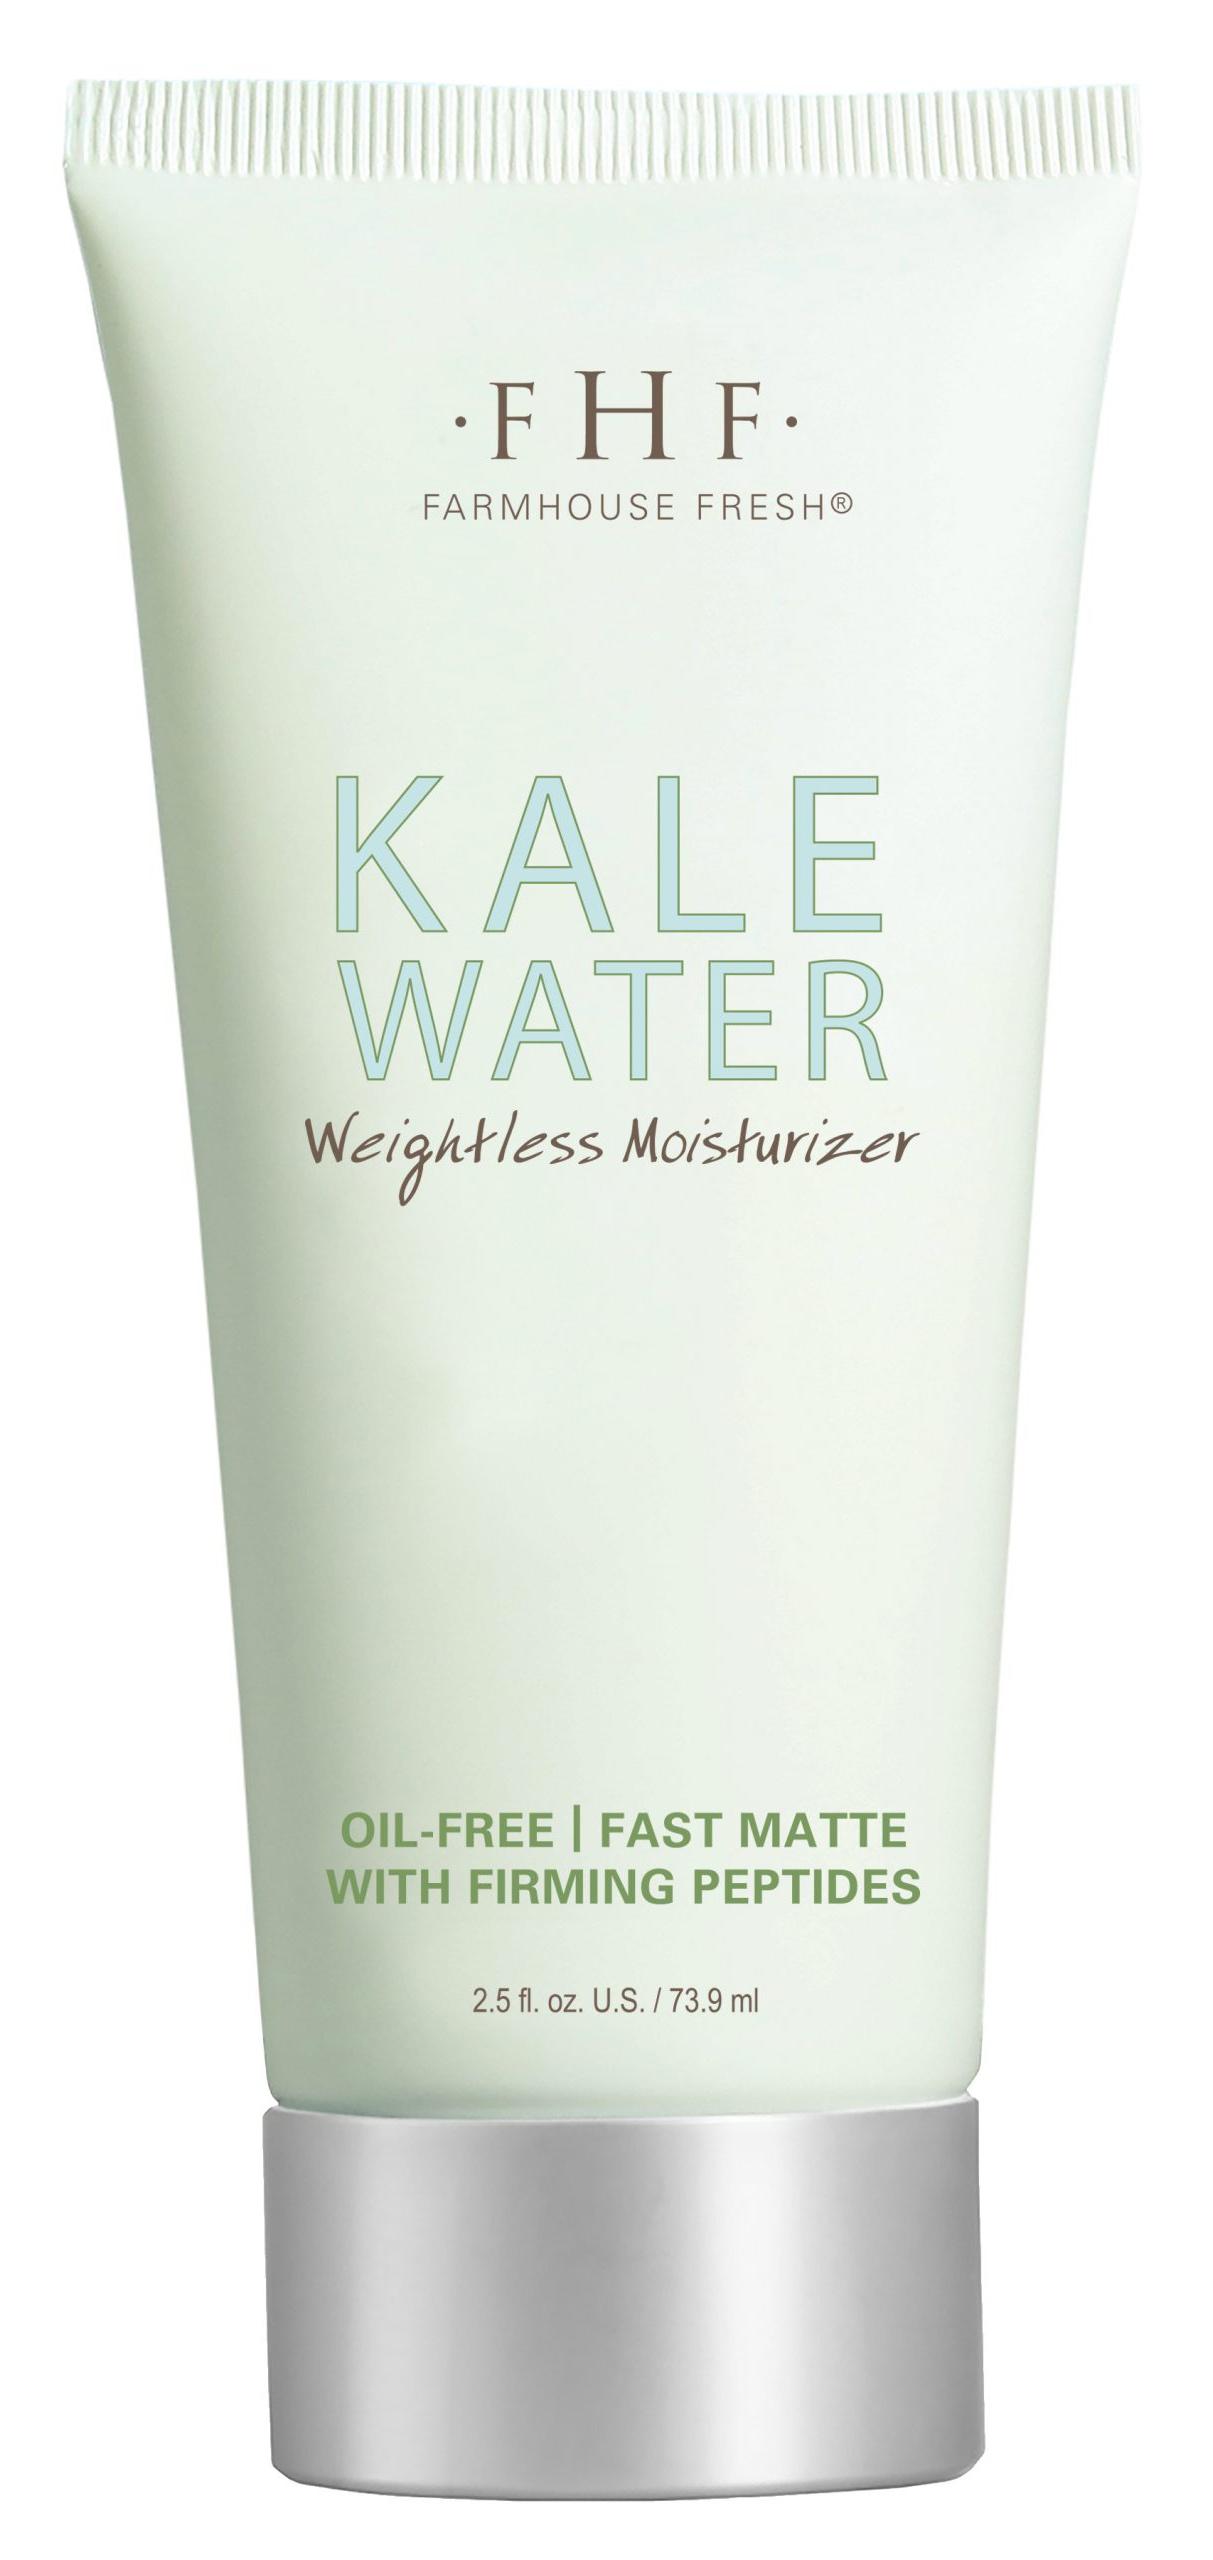 FarmHouse Fresh Kale Water Weightless Moisturizer